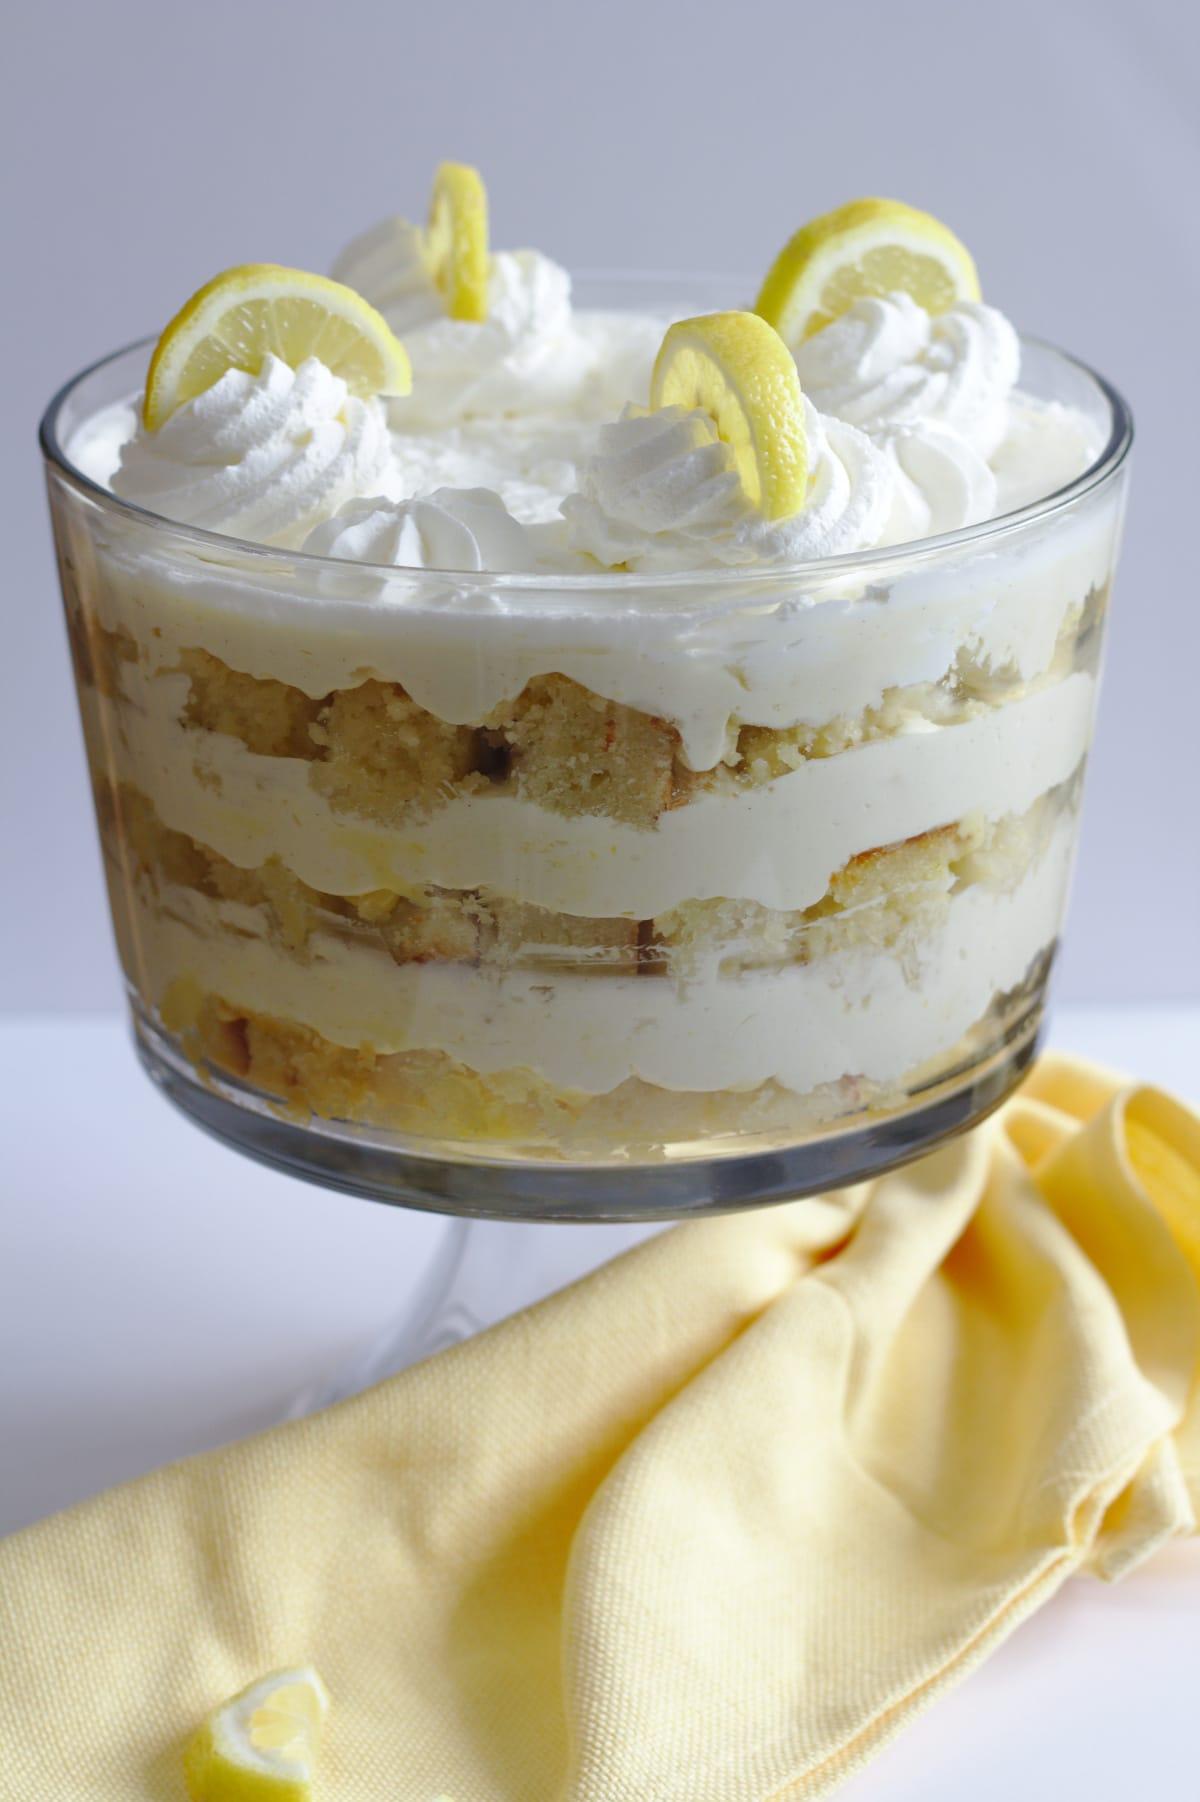 A trifle in a trifle dish.